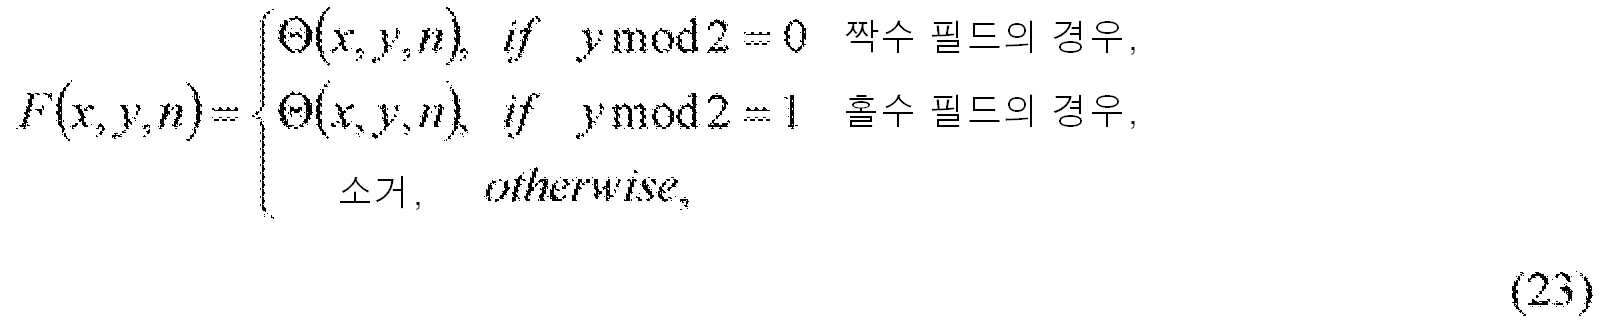 Figure 112008076058963-pct00009